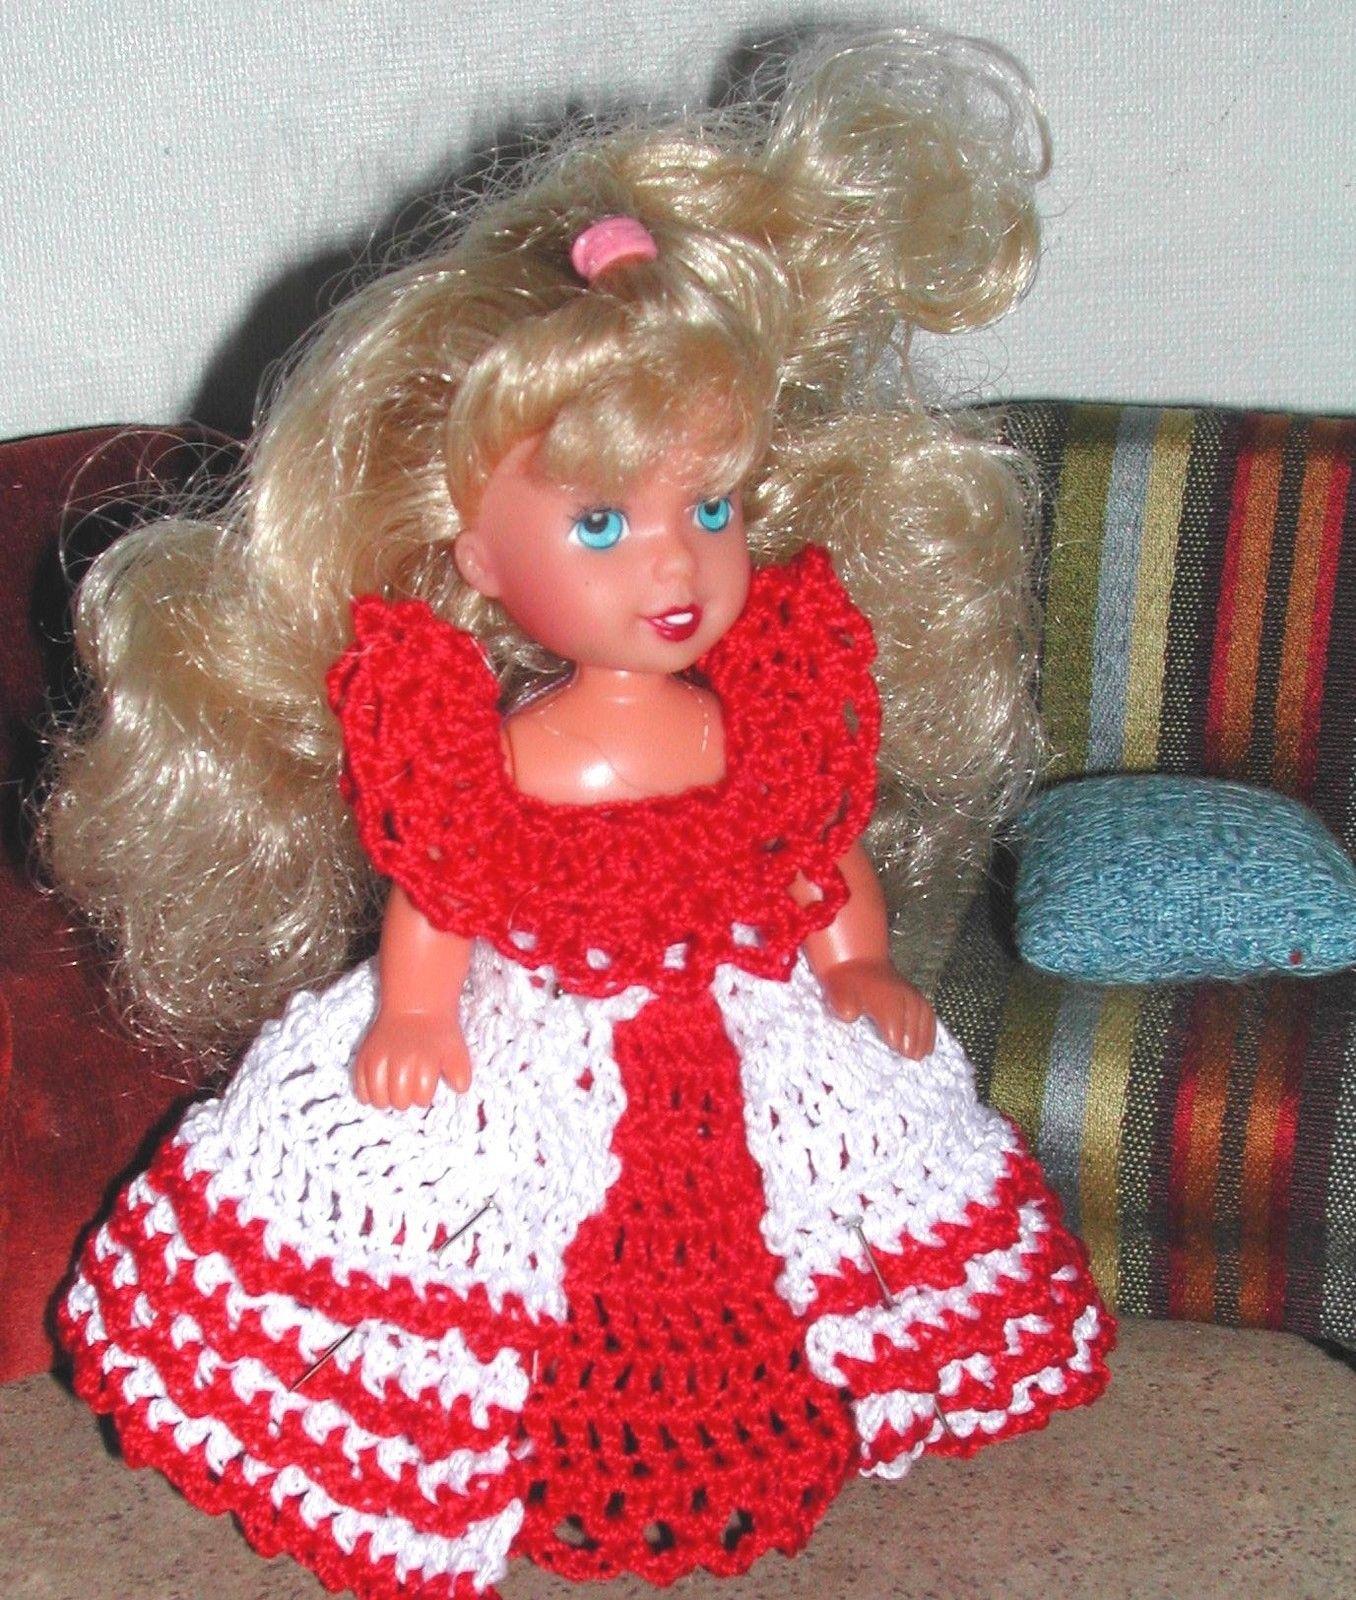 Crochet Fashion Doll Pattern 612 Christmas Kelly's Booklet | eBay